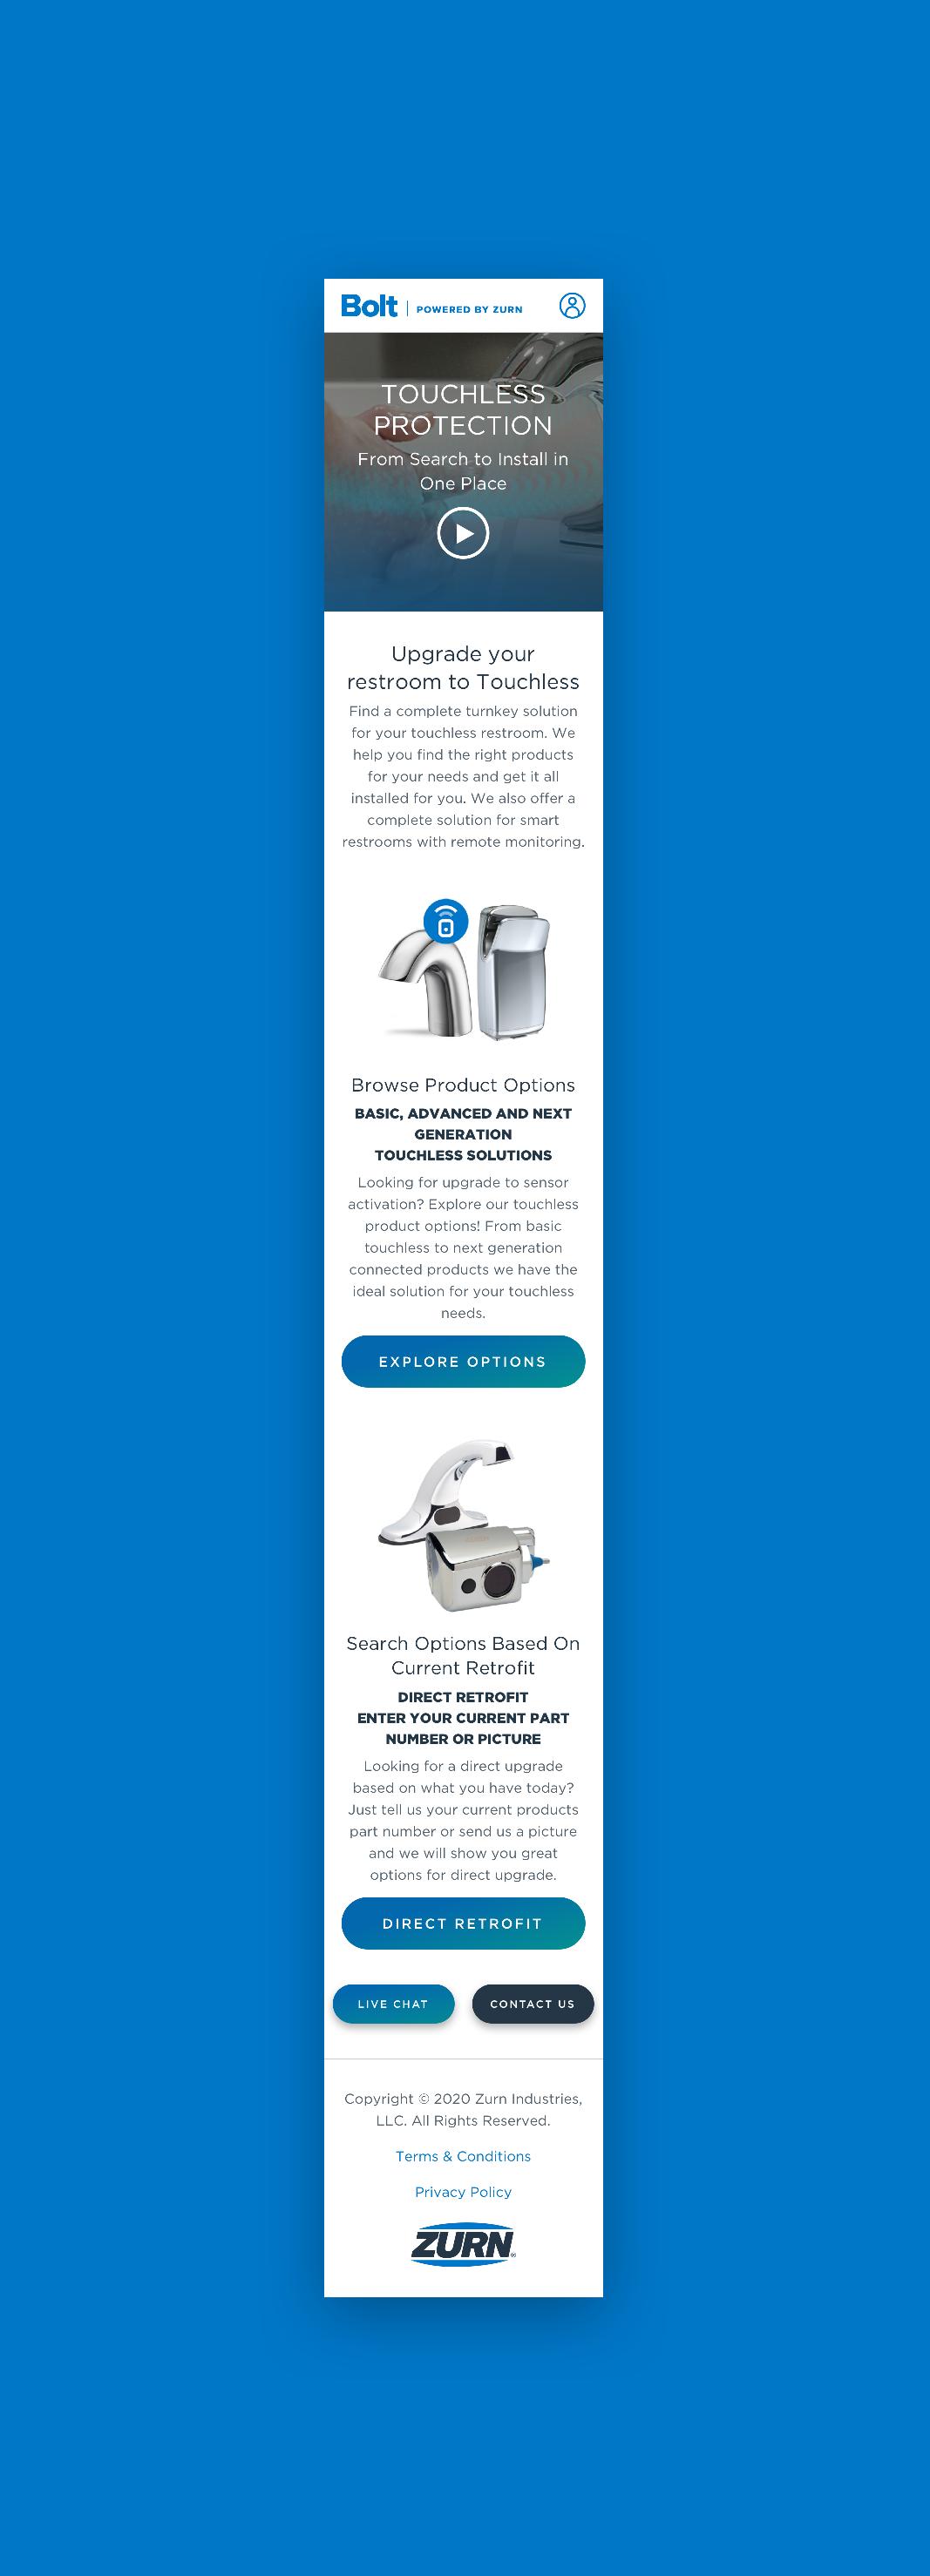 Zurn Mobile Homepage